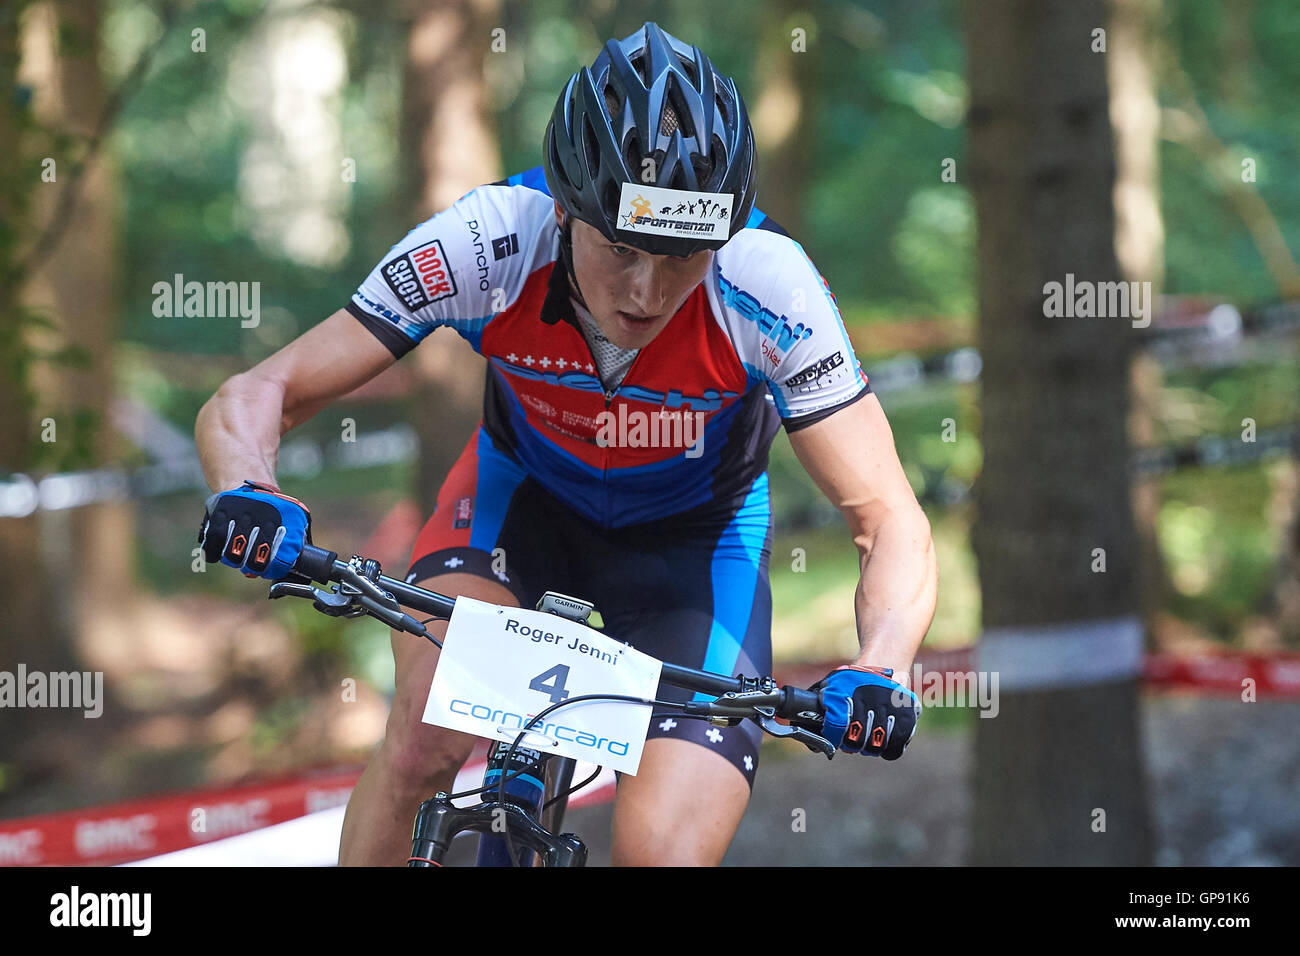 Landquart, Switzerland. 3rd September 2016. Winner Roger Jenni during the Grisons mountainbike championships in - Stock Image